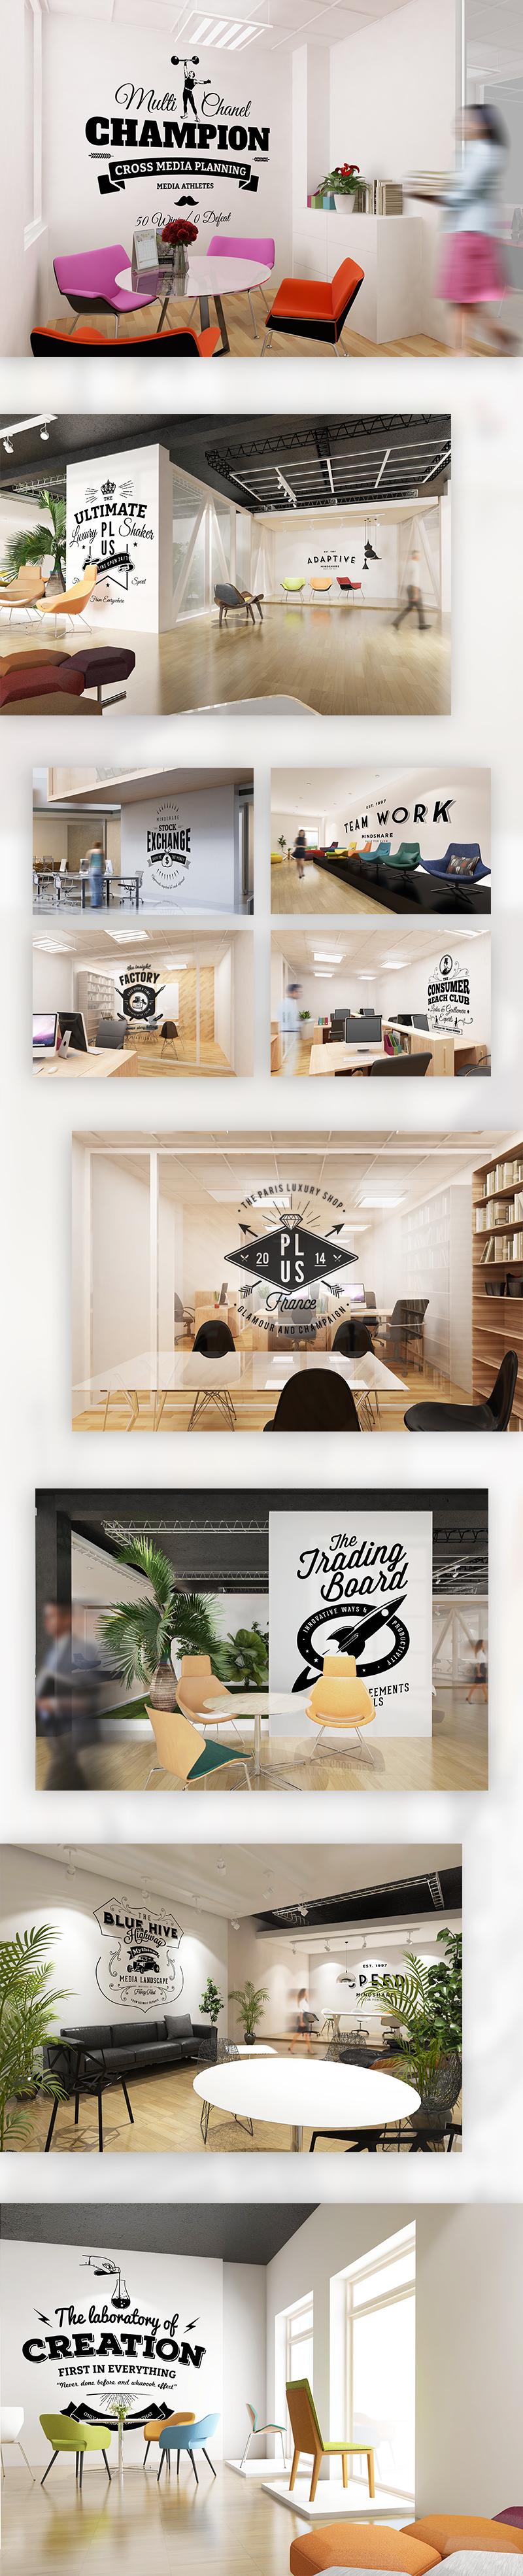 Directeur artistique freelance - Agence Mindshare - Illustration / logotype